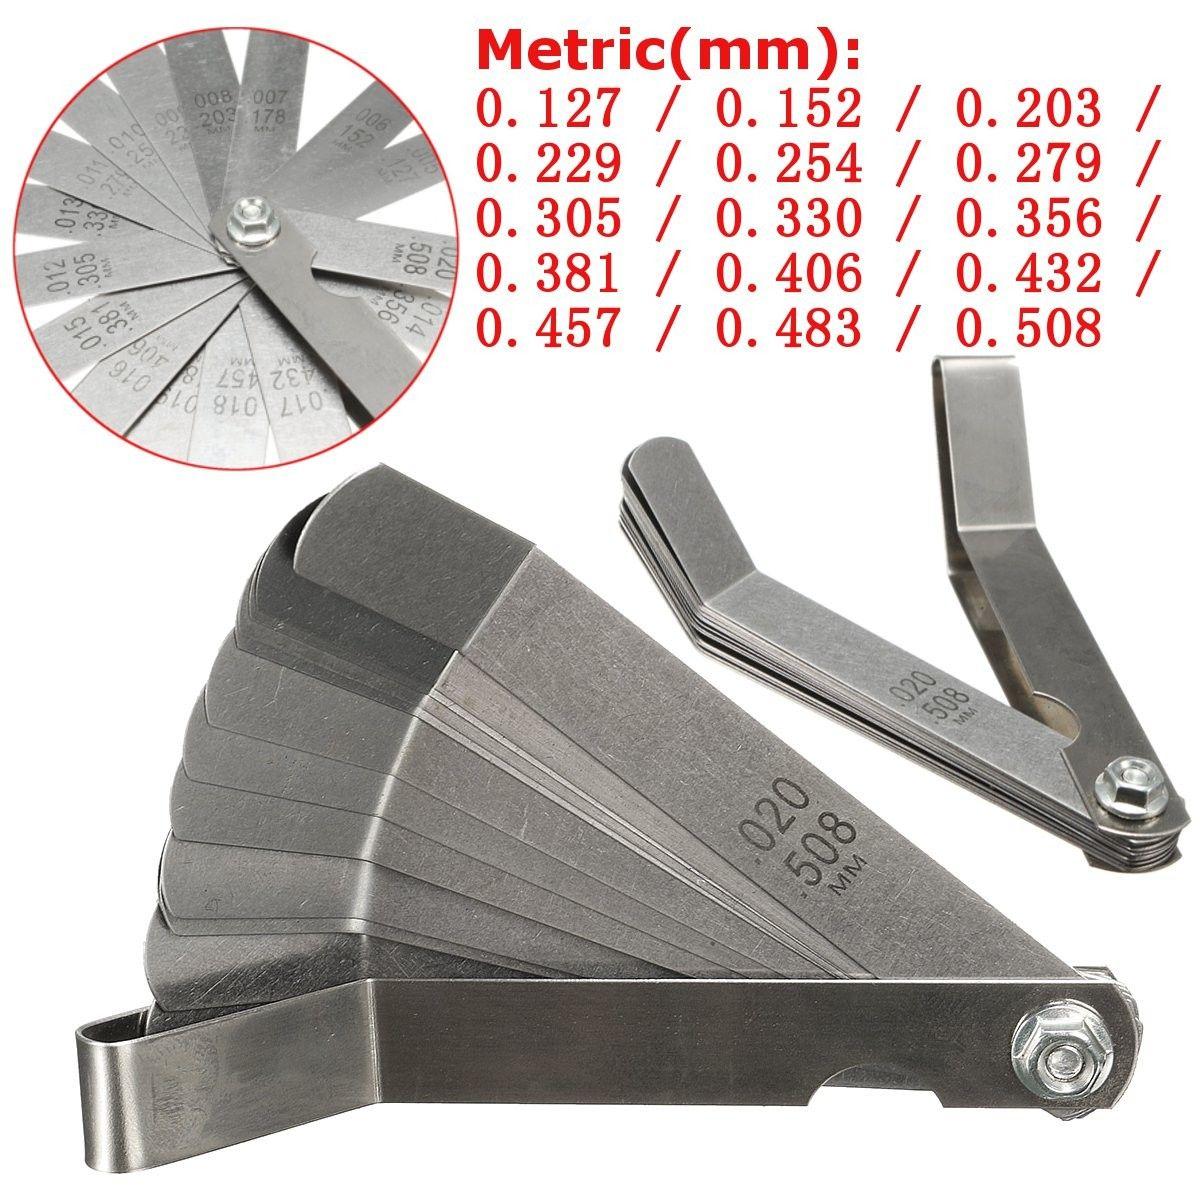 US STOCK Stainless steel Metric 0.127-0.508mm Valve Offset Feeler Gauge 16Blades